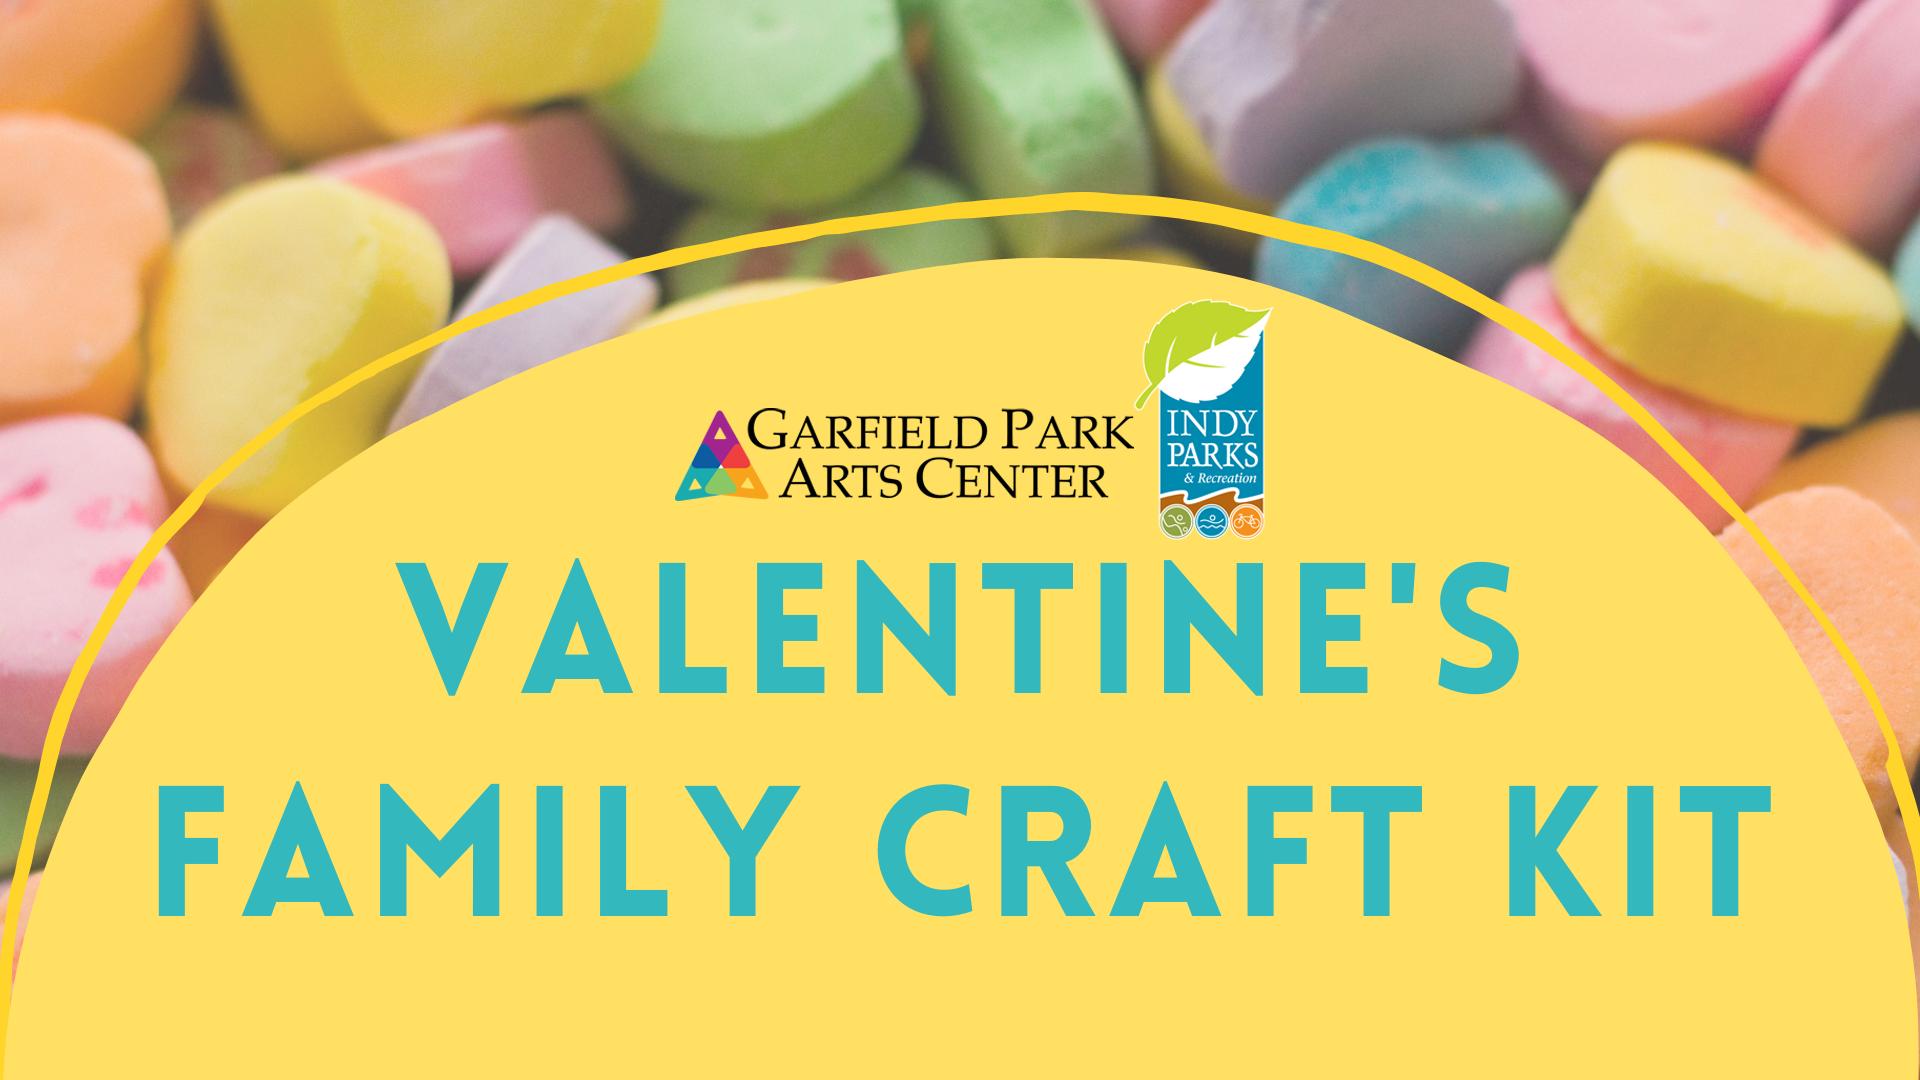 Valentine's Family Craft Kit